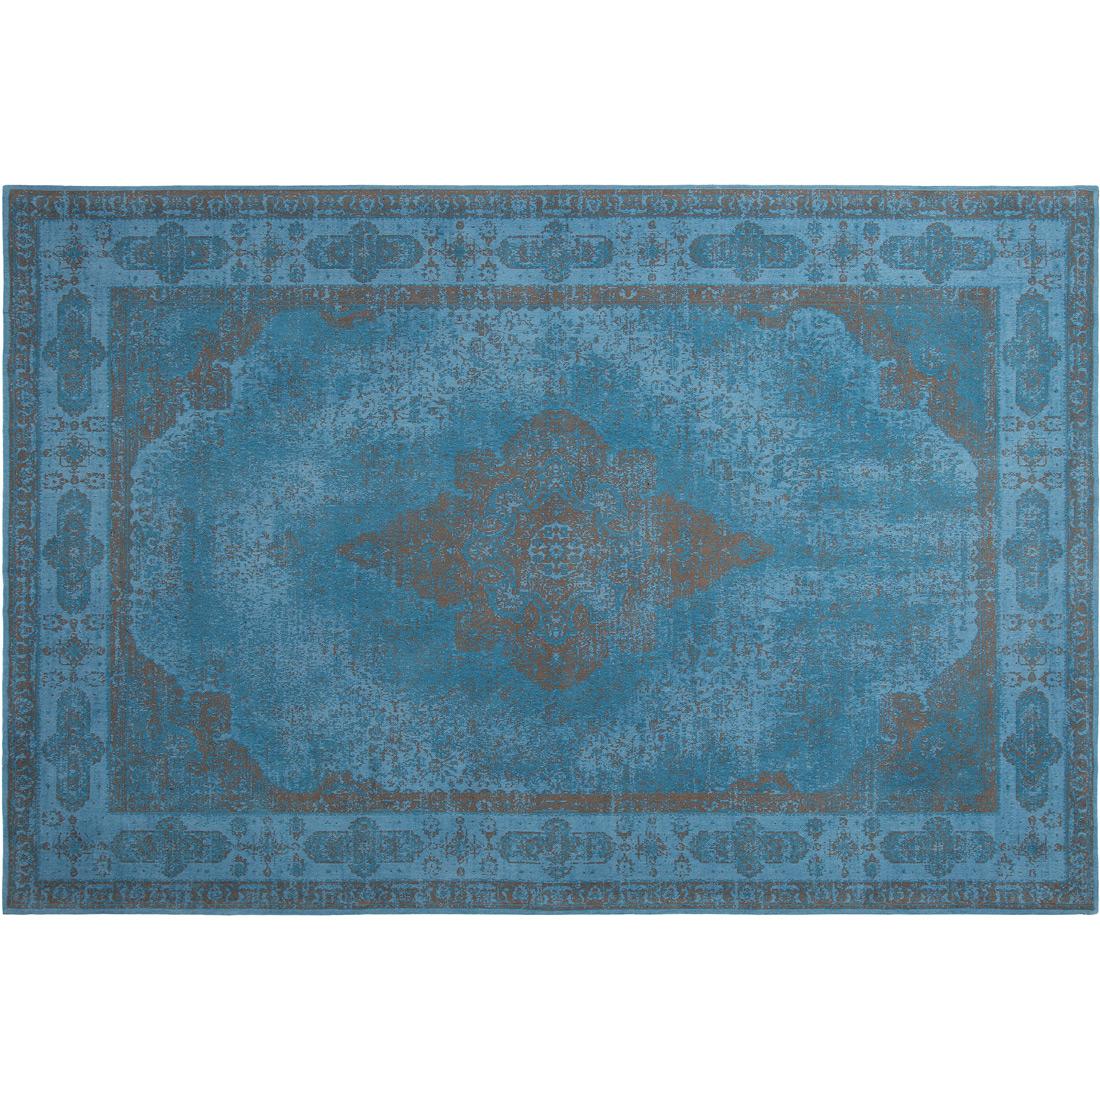 Vloerkleed Xilento Design Azur Blue 1 | 160 x 230 cm